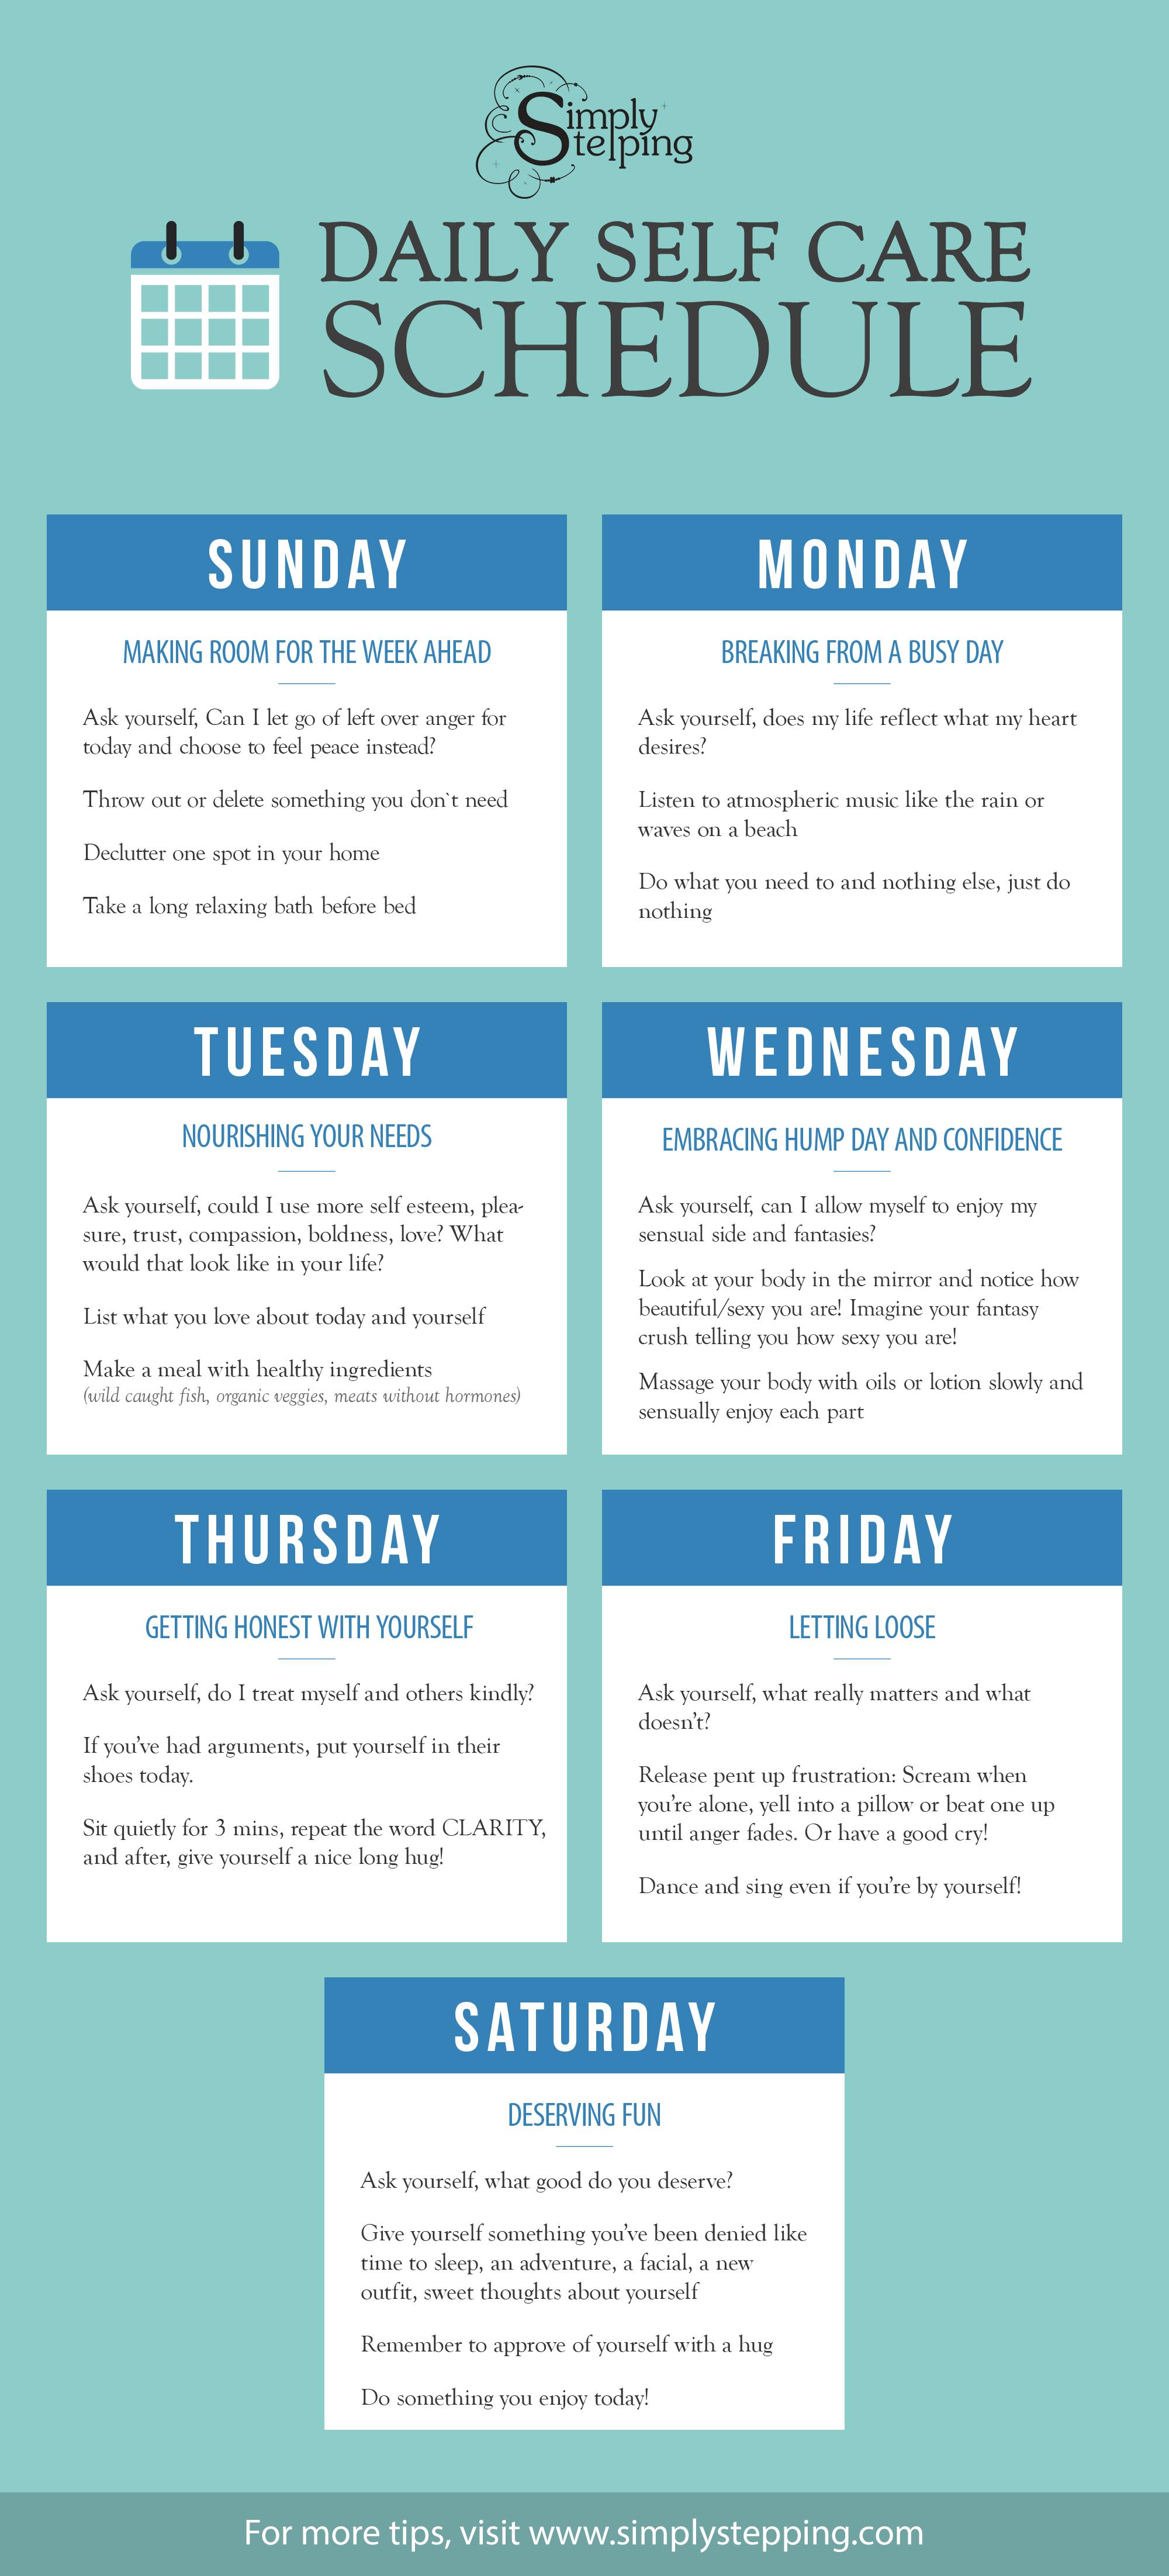 Daily Self Care Schedule